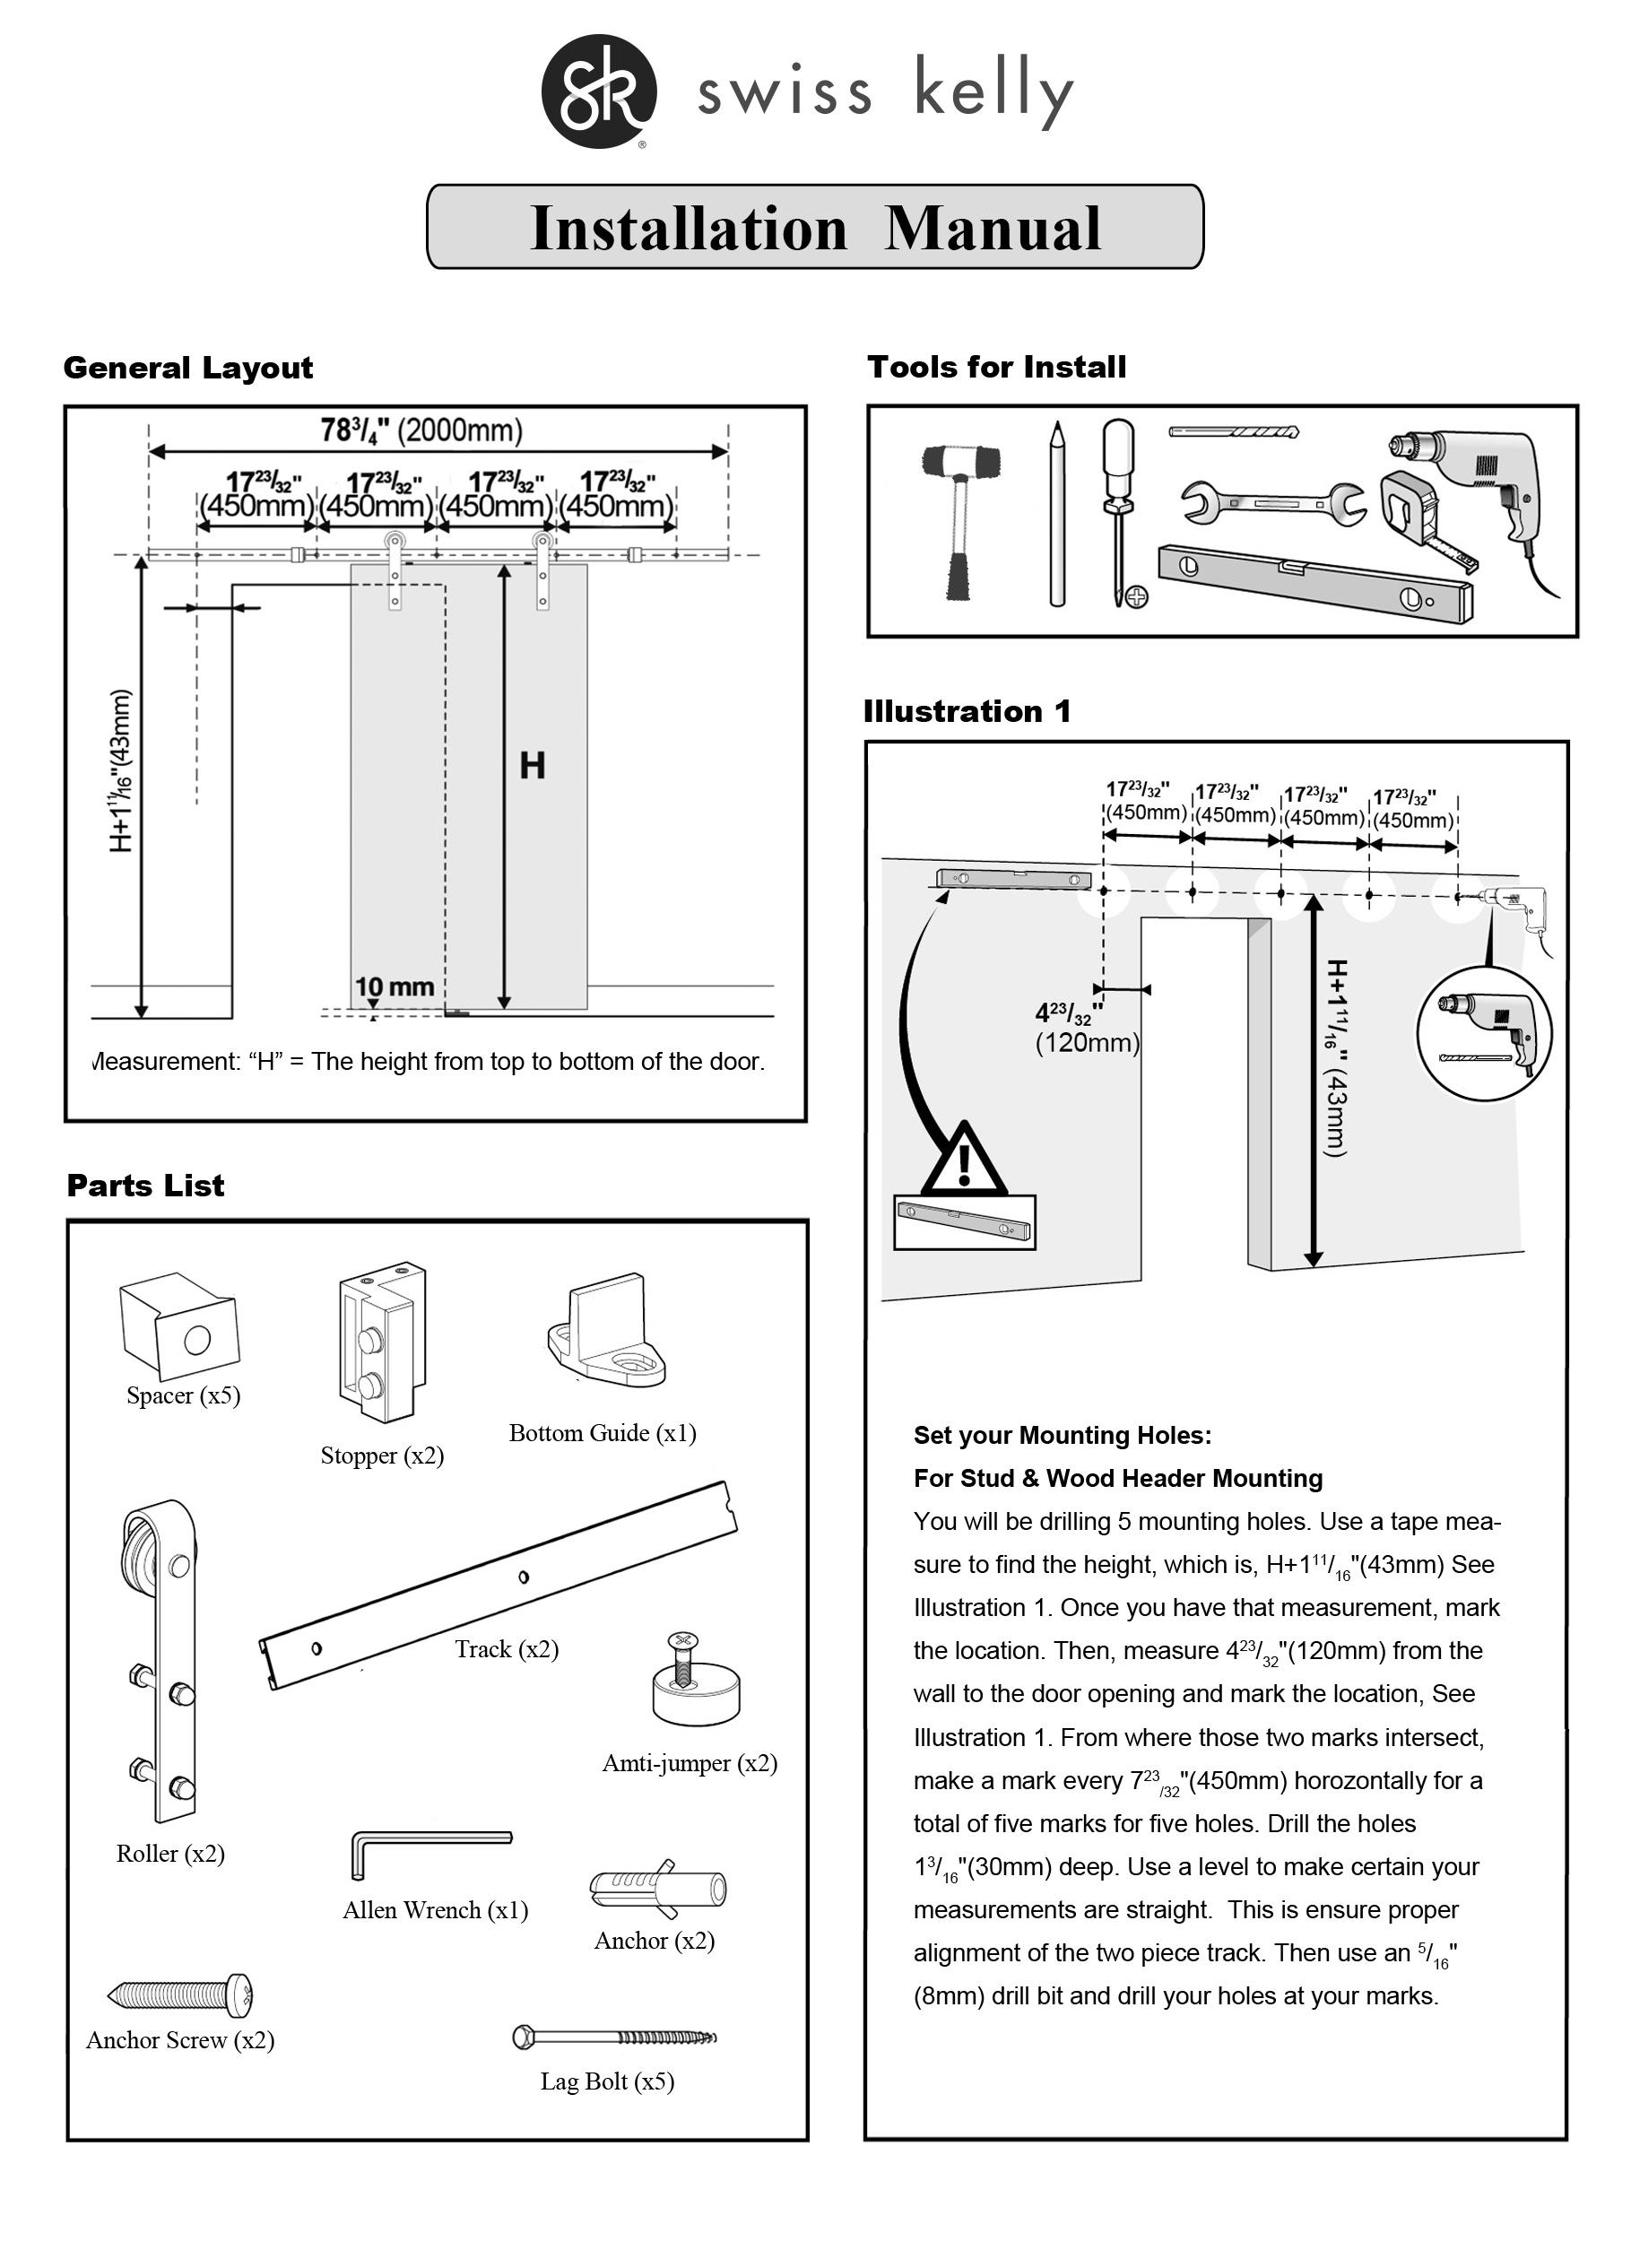 manual-with-logo-01.jpg